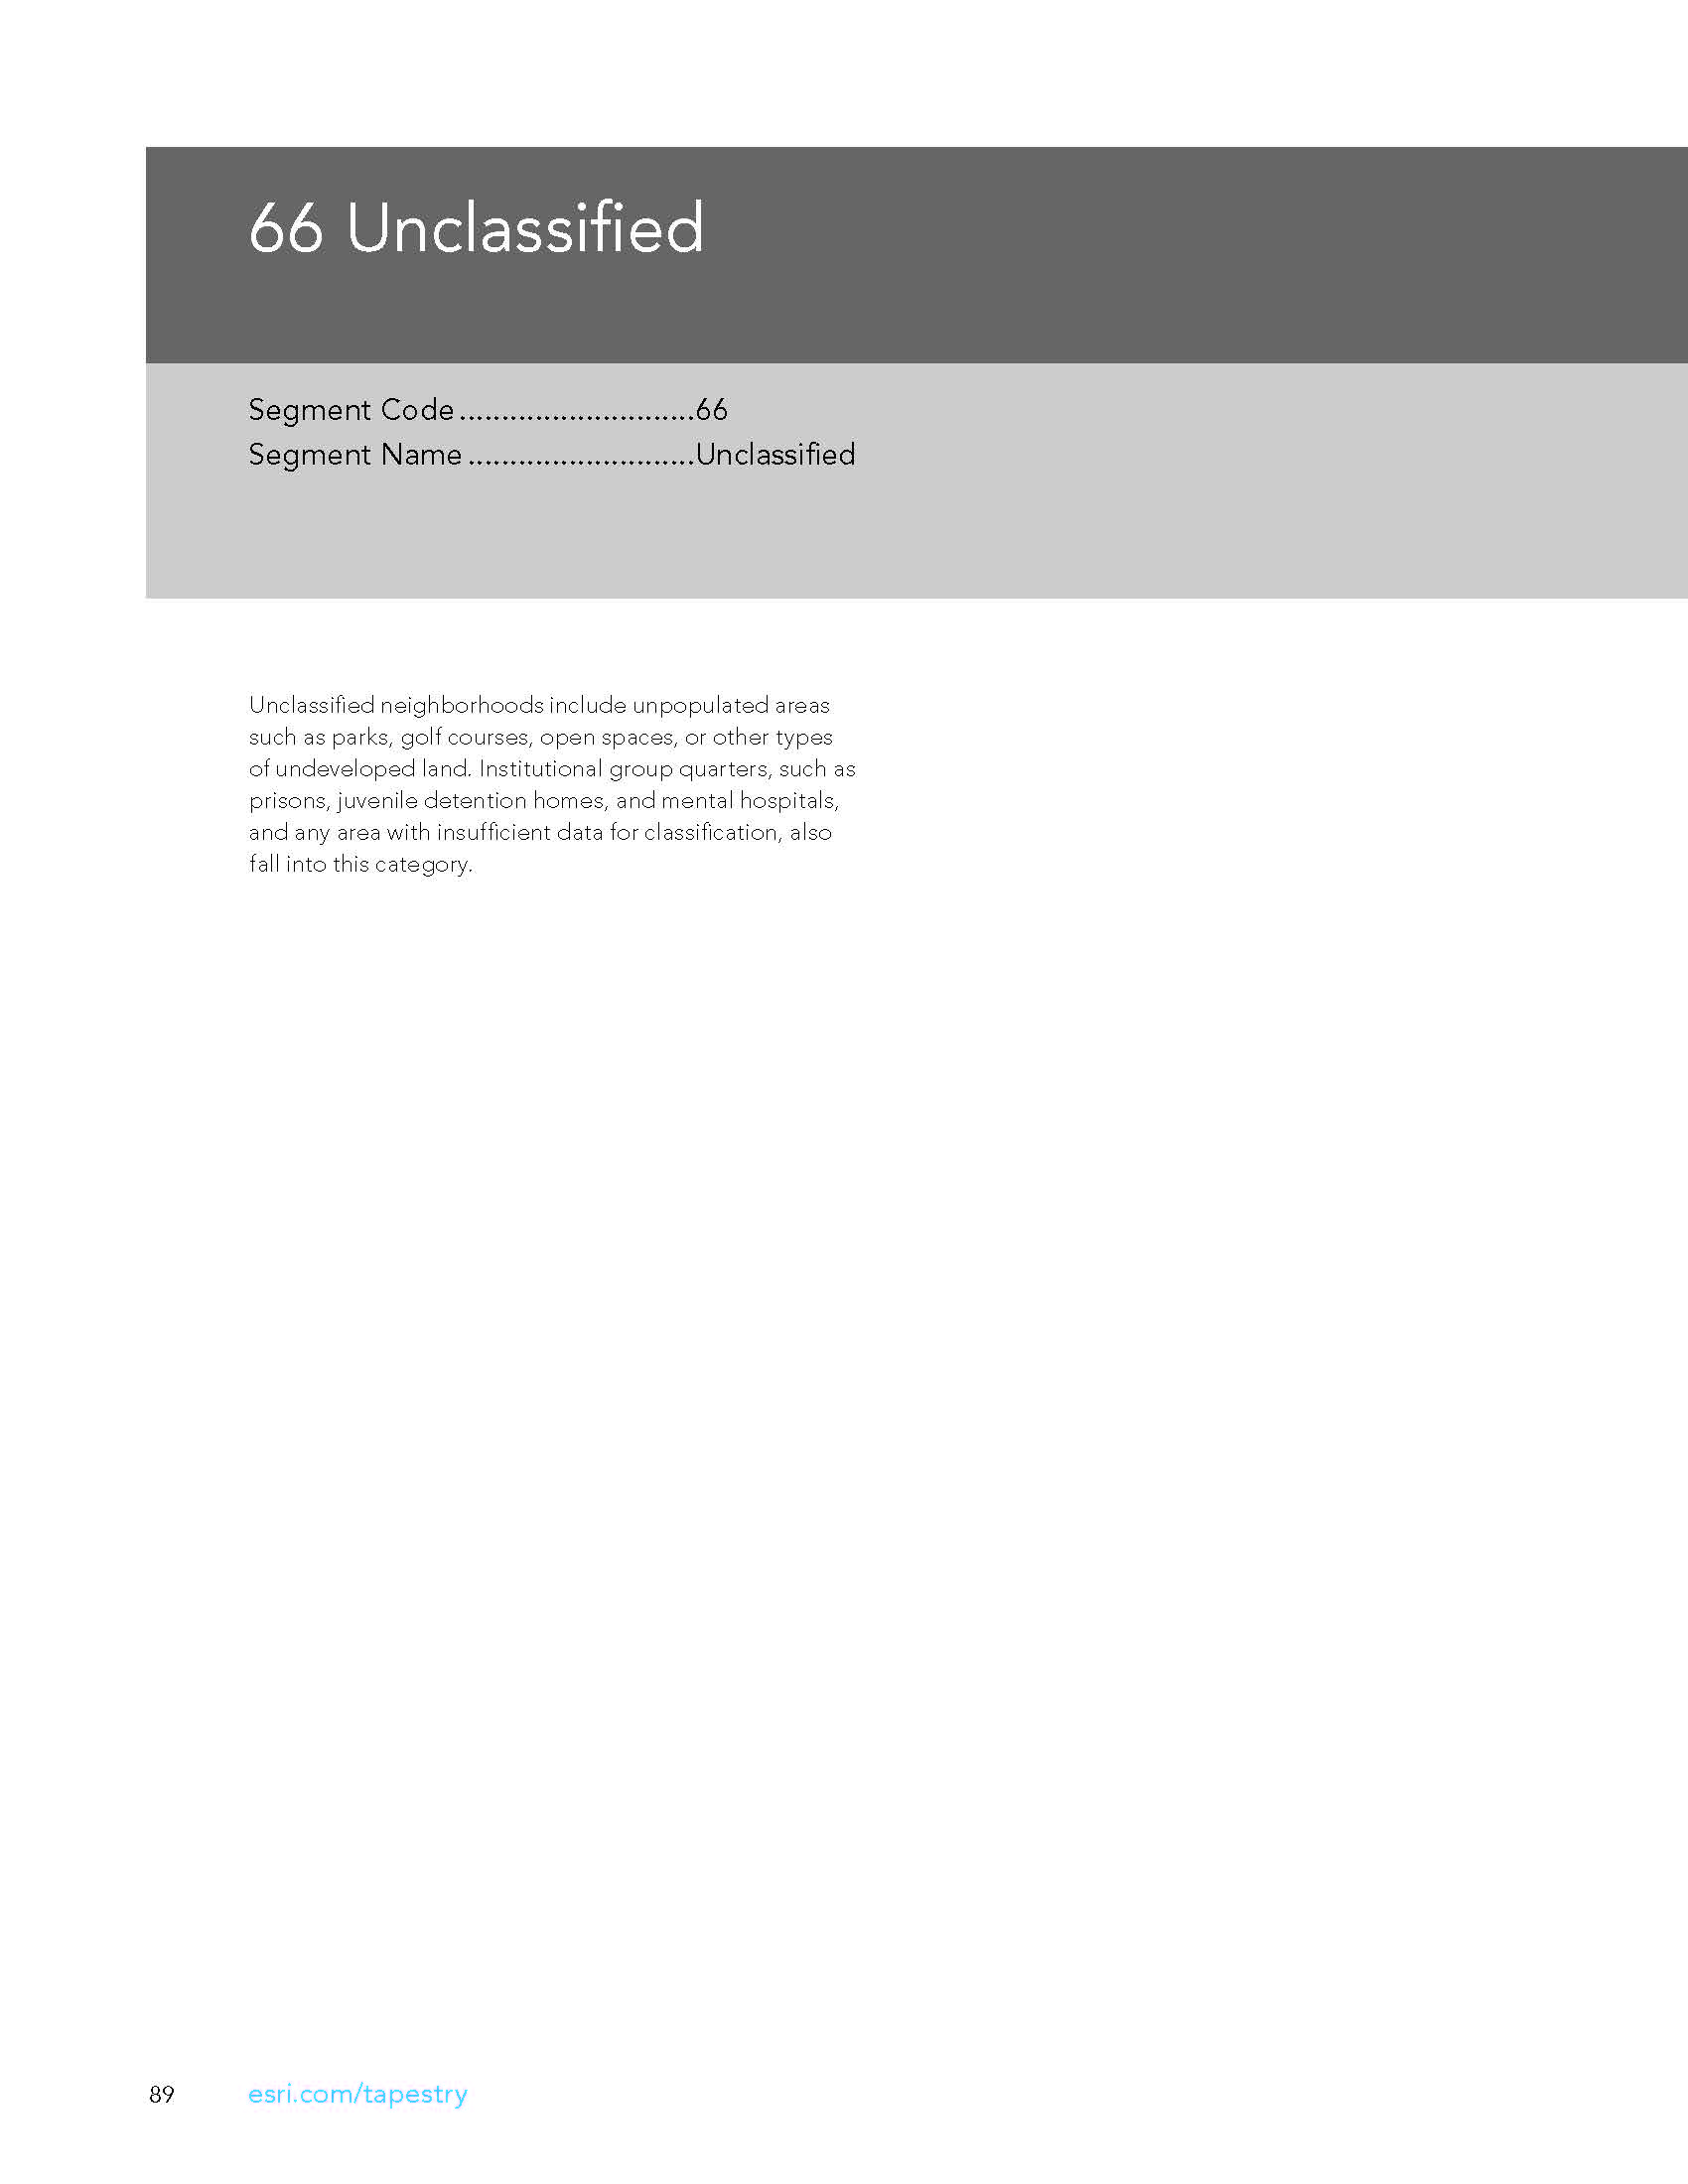 tapestry-segmentation_Page_92.jpg